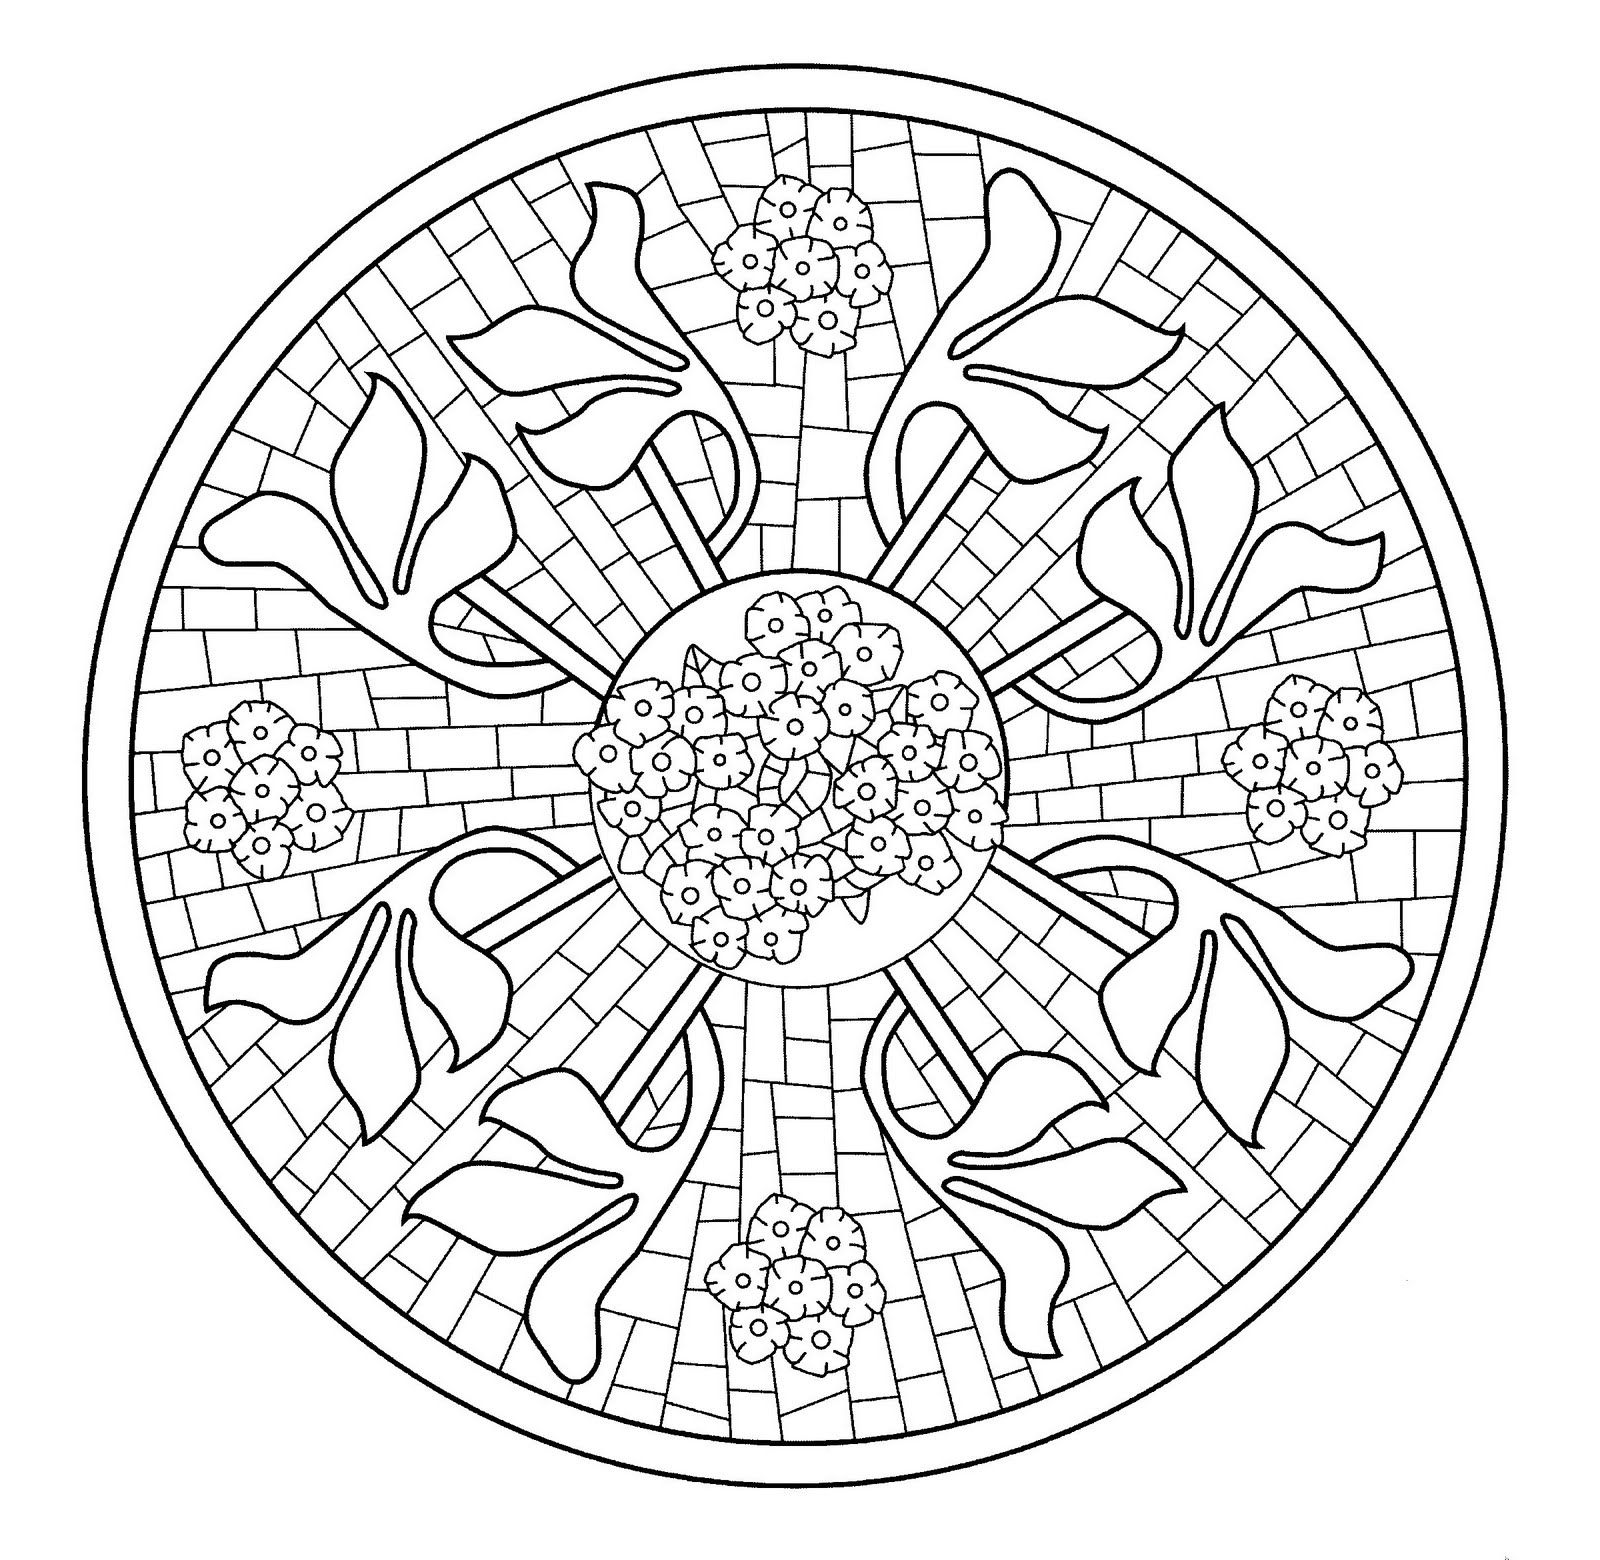 Pin de Malusita San en Mandalas | Pinterest | Dibujo de mandala ...